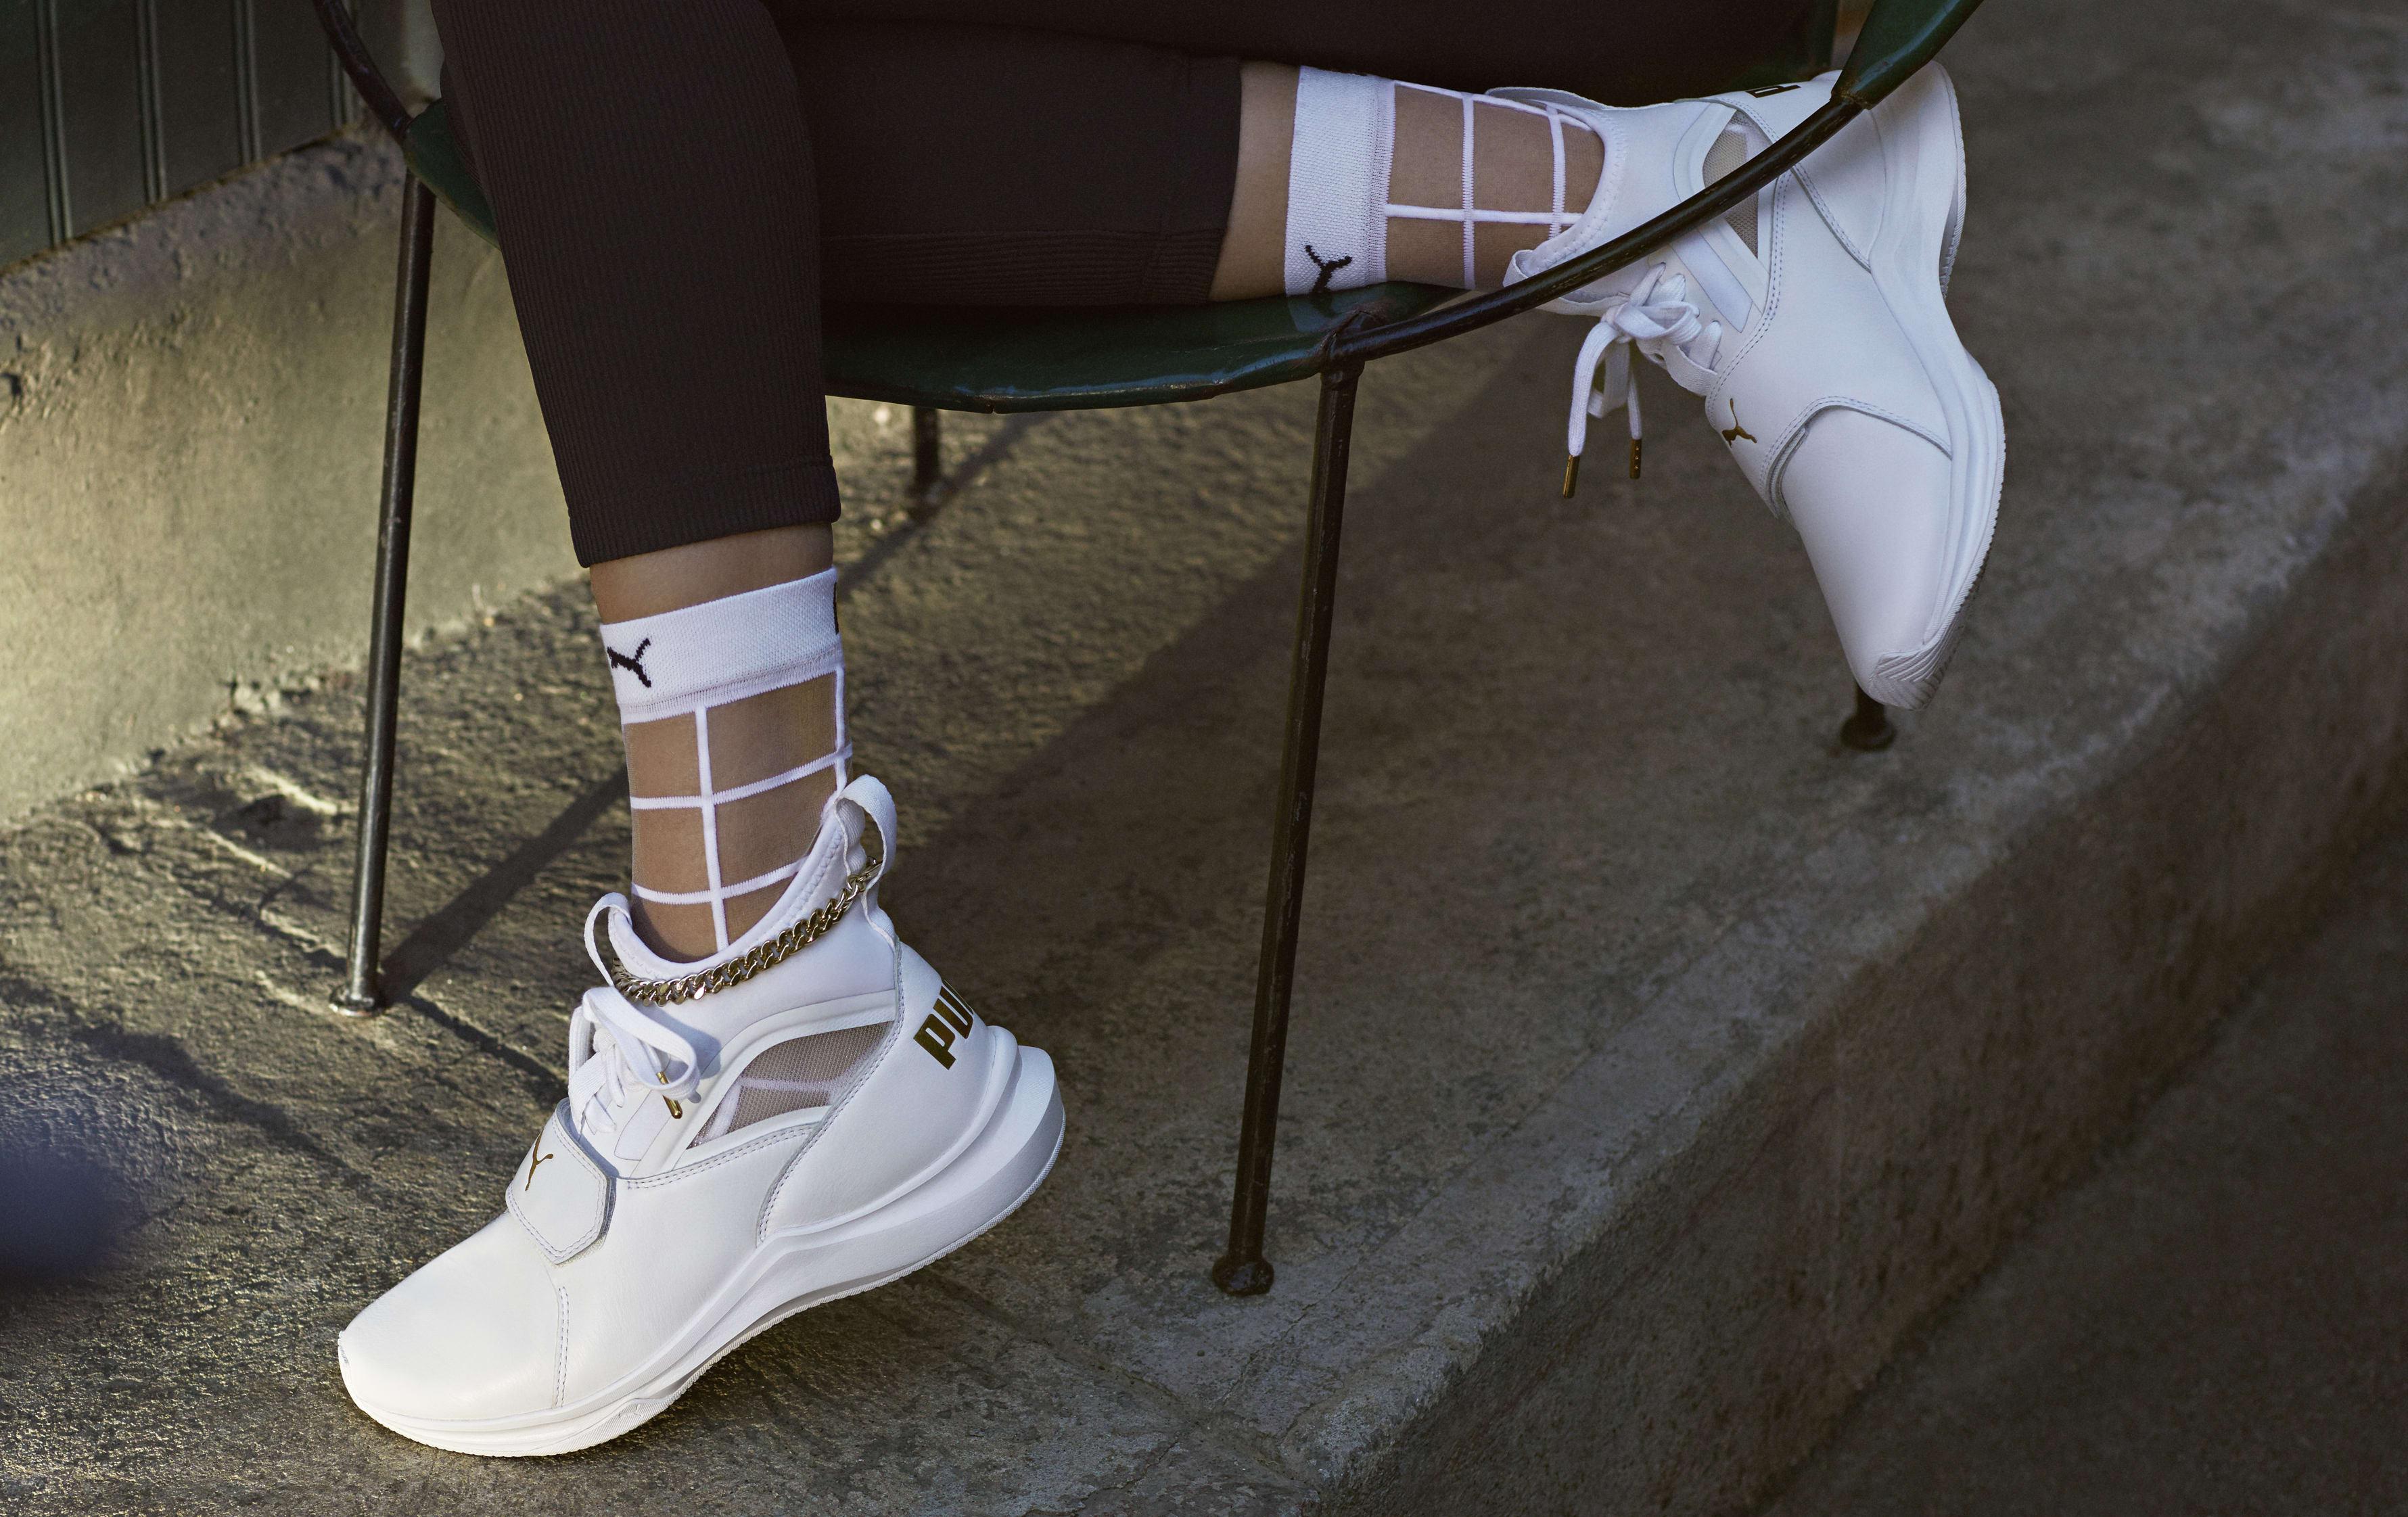 81e6683a960c99 Selena Gomez debuts her own Puma shoe